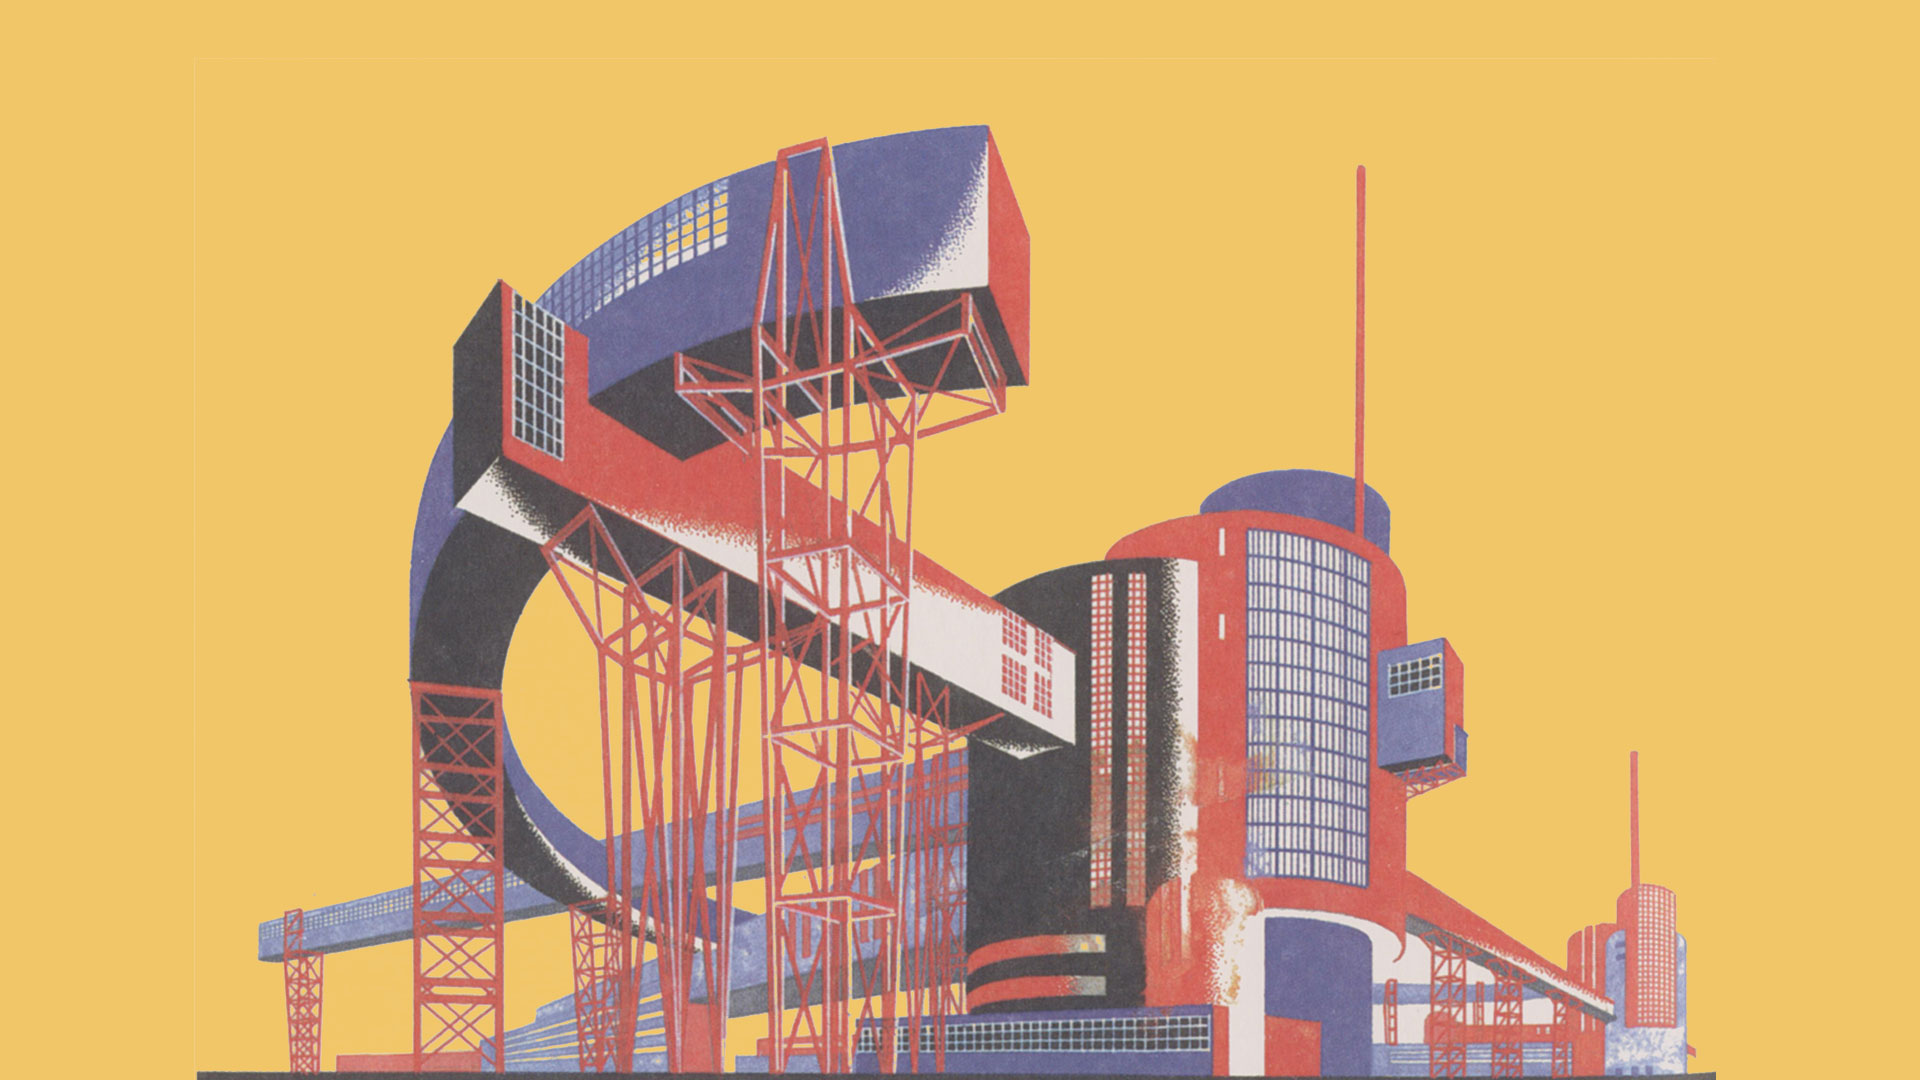 Megacontrucciones